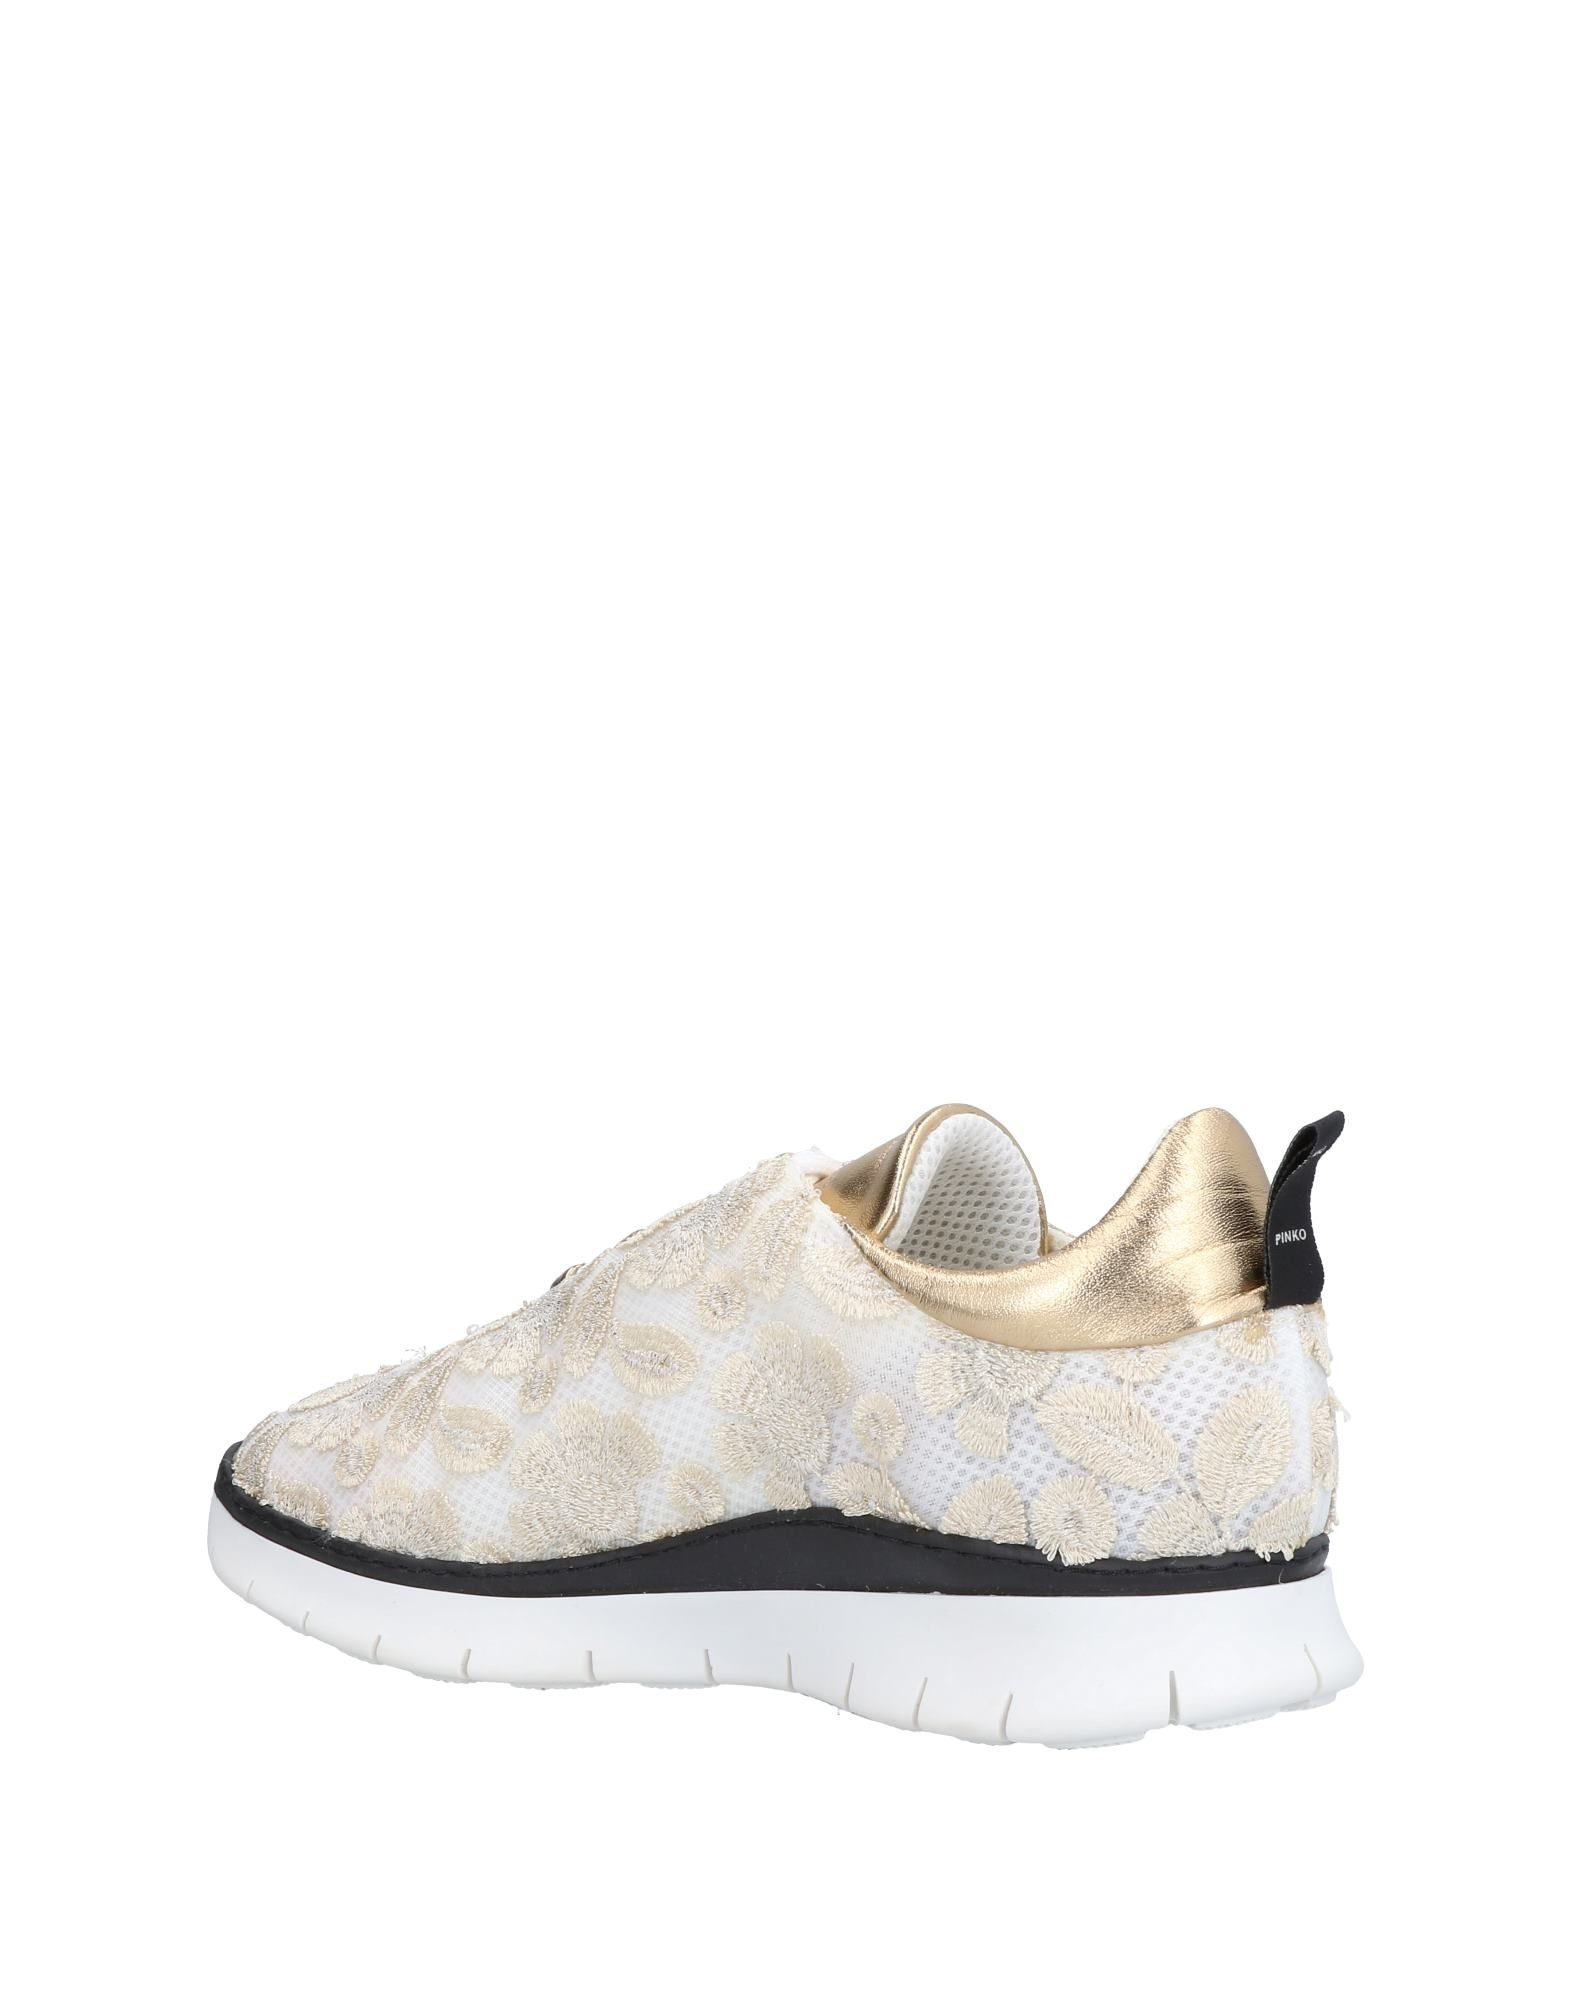 Pinko 11504857TE Sneakers Damen  11504857TE Pinko Gute Qualität beliebte Schuhe d99b26